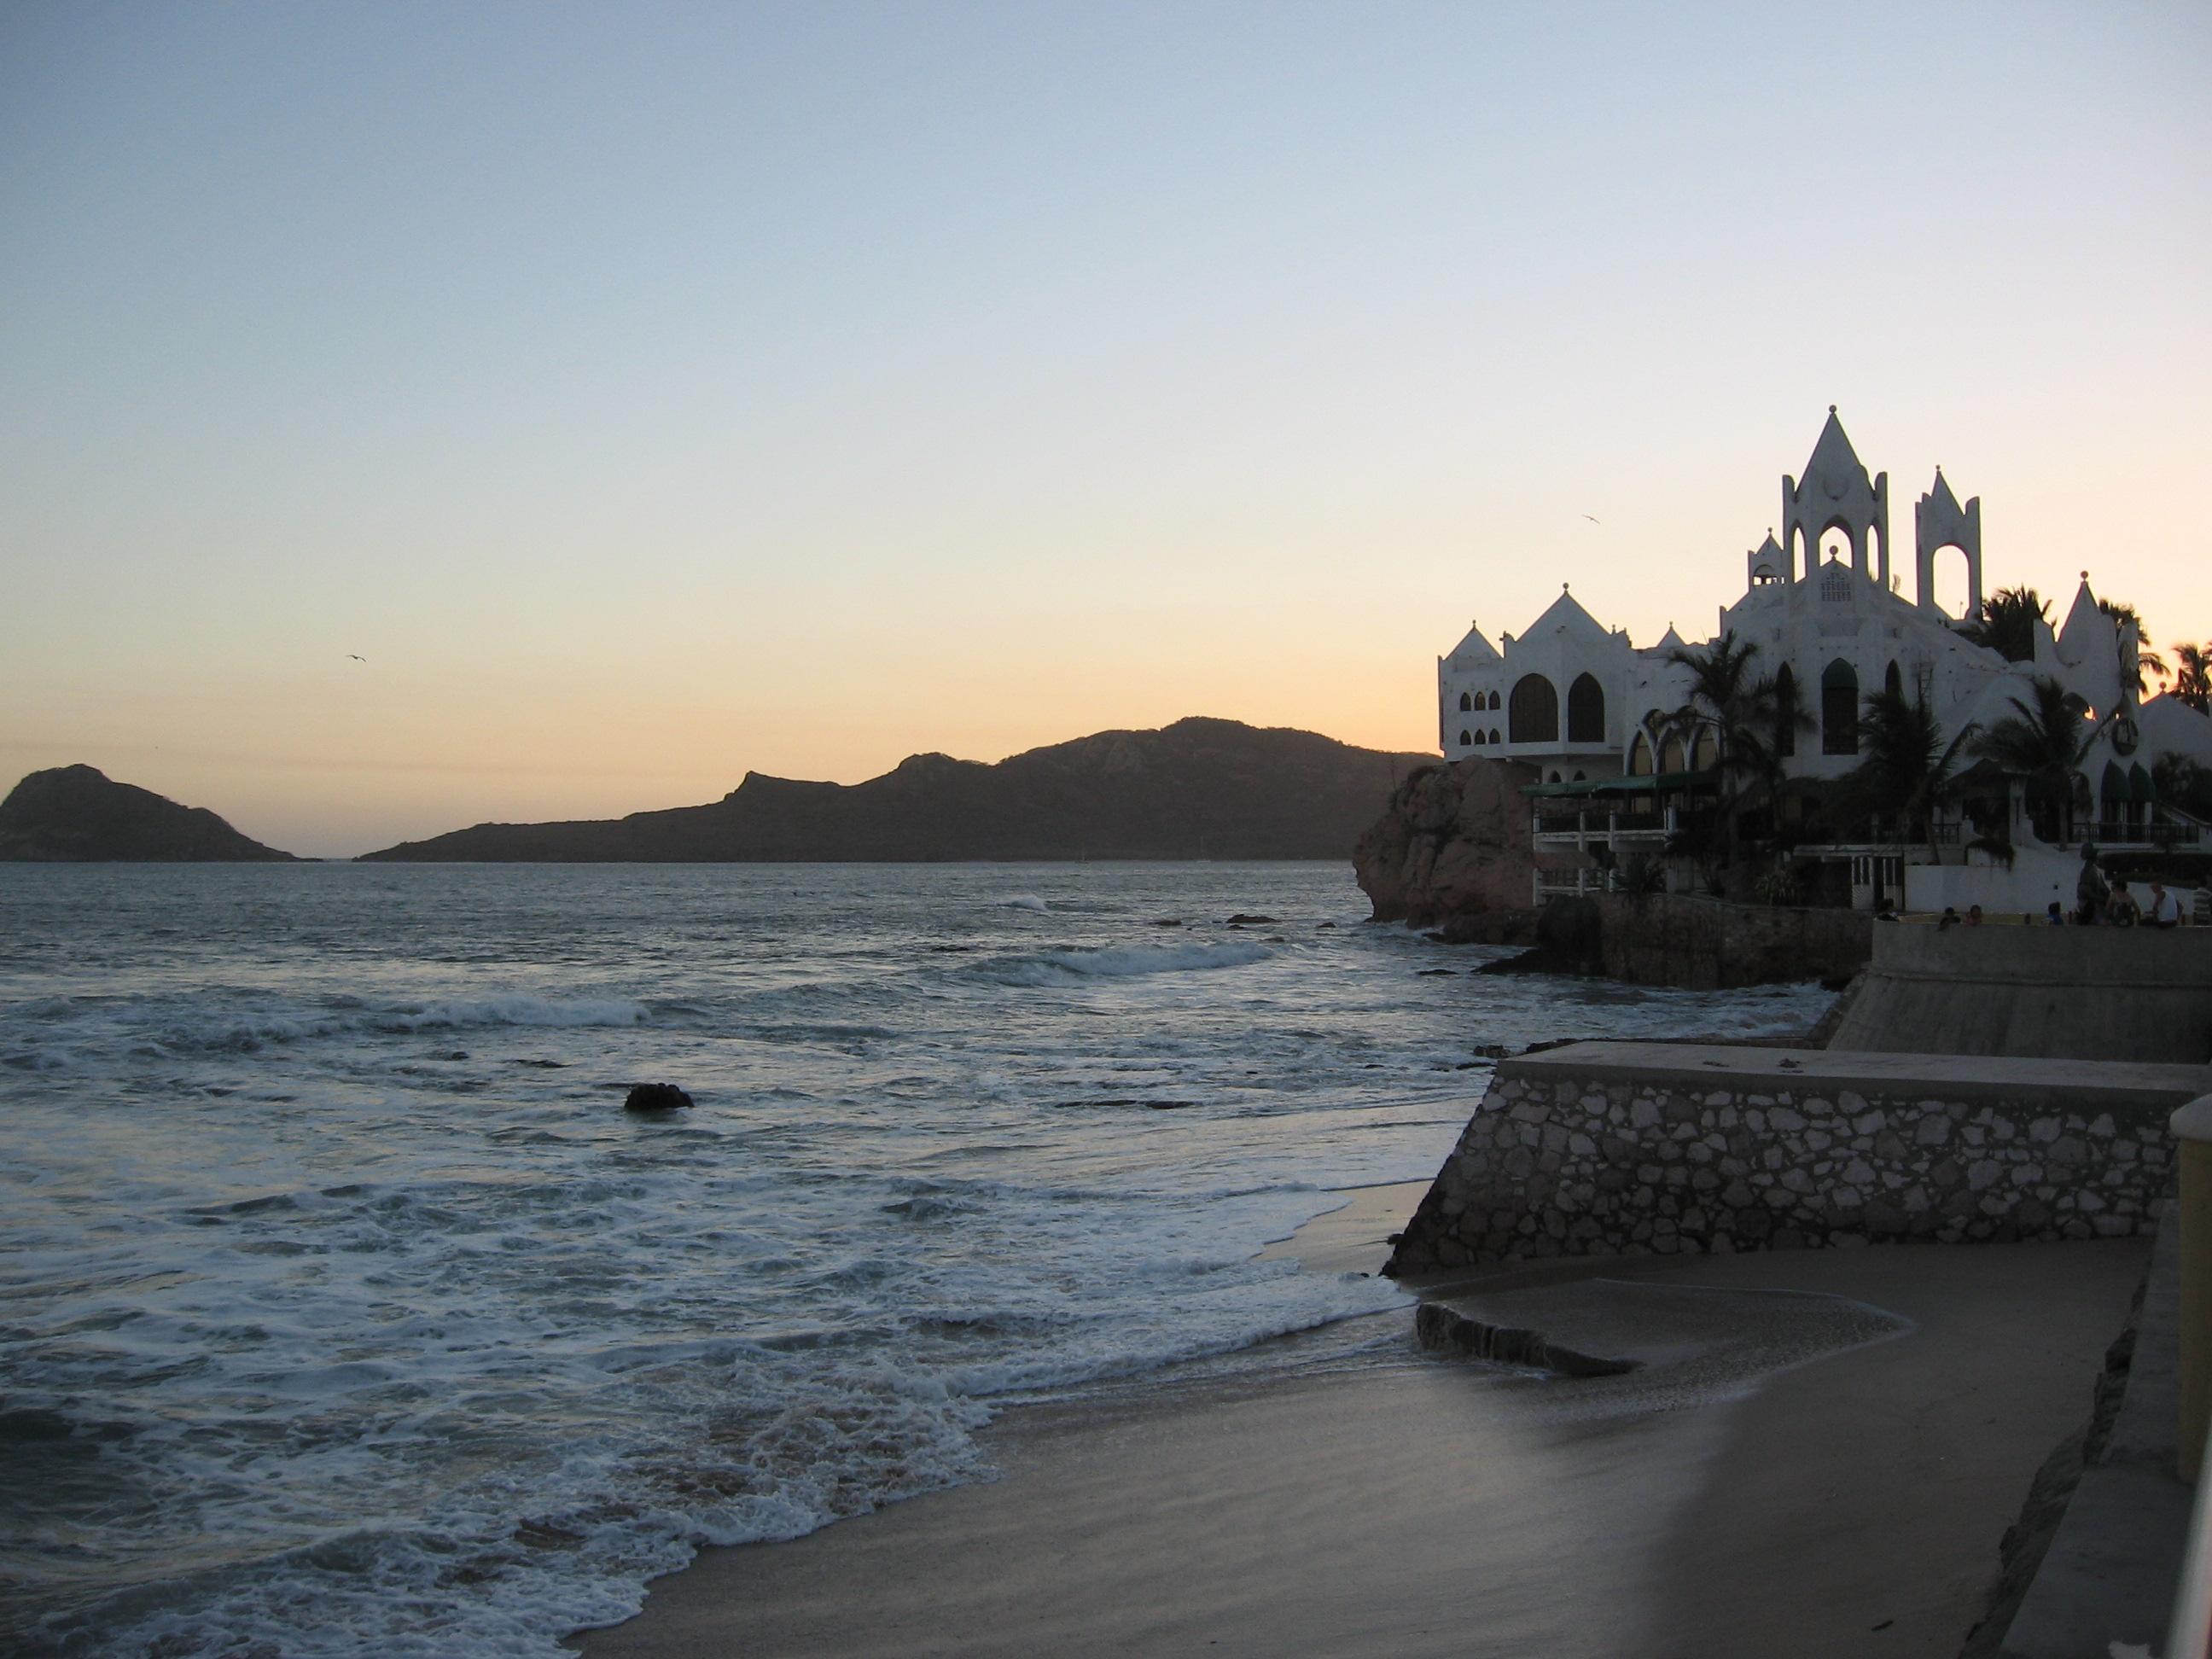 La Playa Mexican Restaurant Fort Bragg Menu